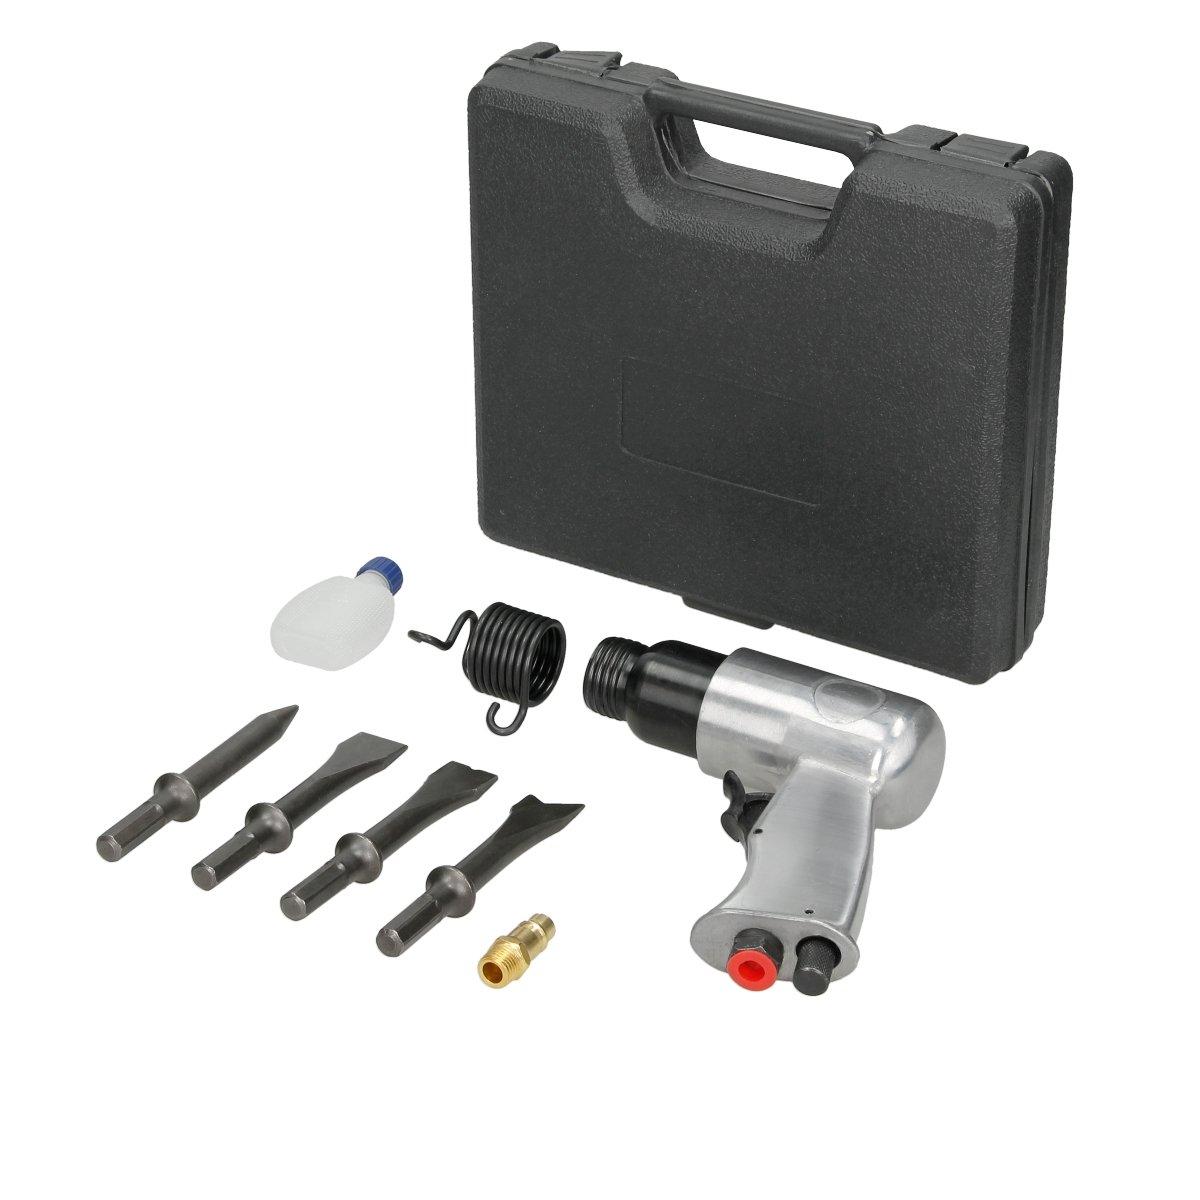 ECD Germany Martillo cincelador neum/ático 6 Bar 150 l//min con 4 Cinceles para diferentes aplicaciones